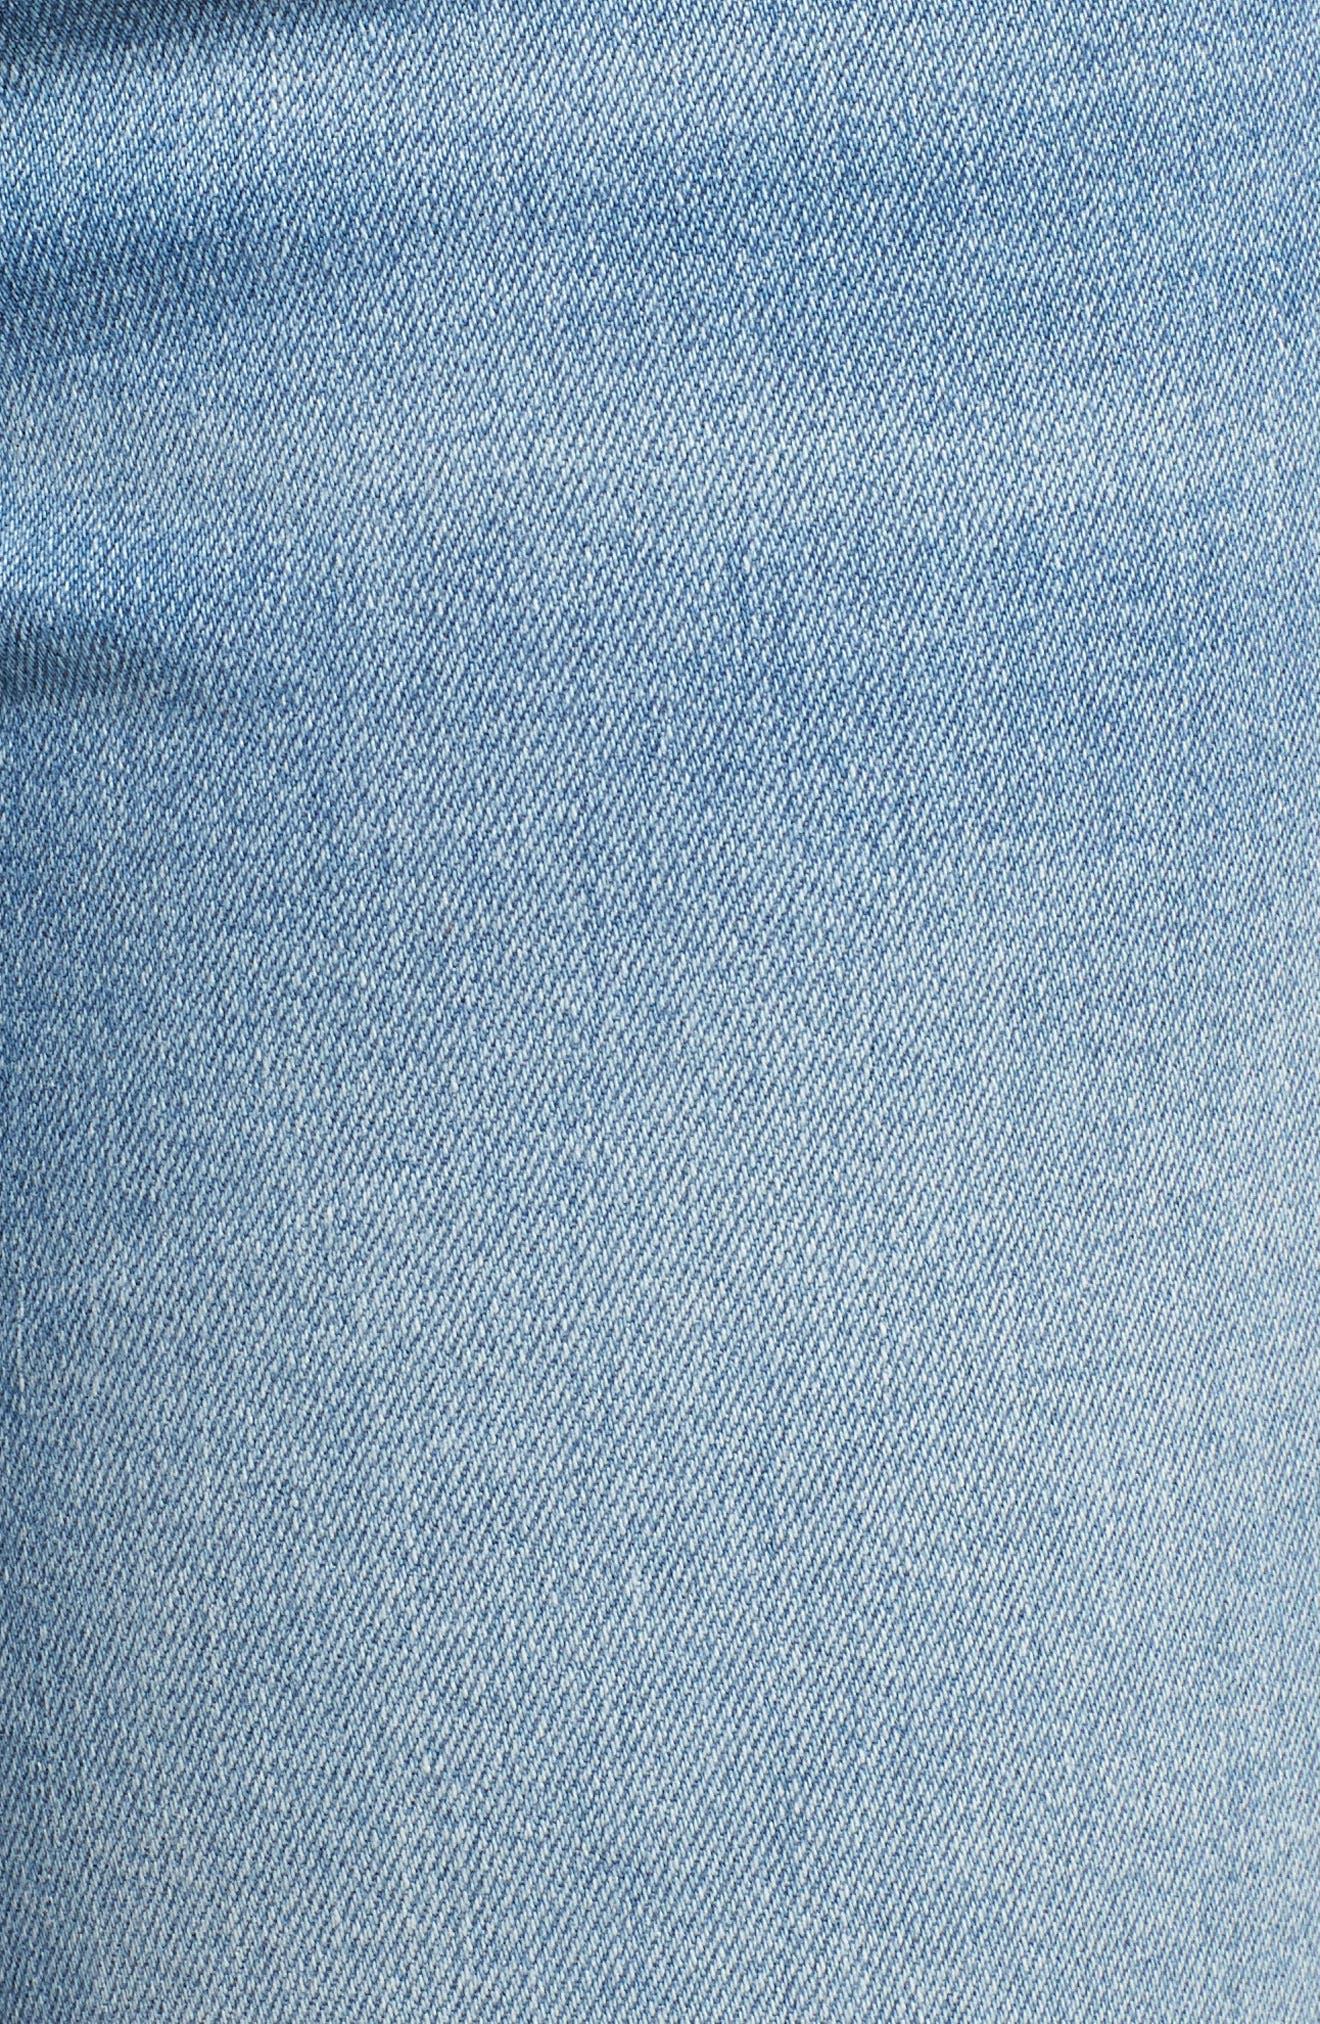 Adriana Ankle Zip Step Hem Jeans,                             Alternate thumbnail 6, color,                             420